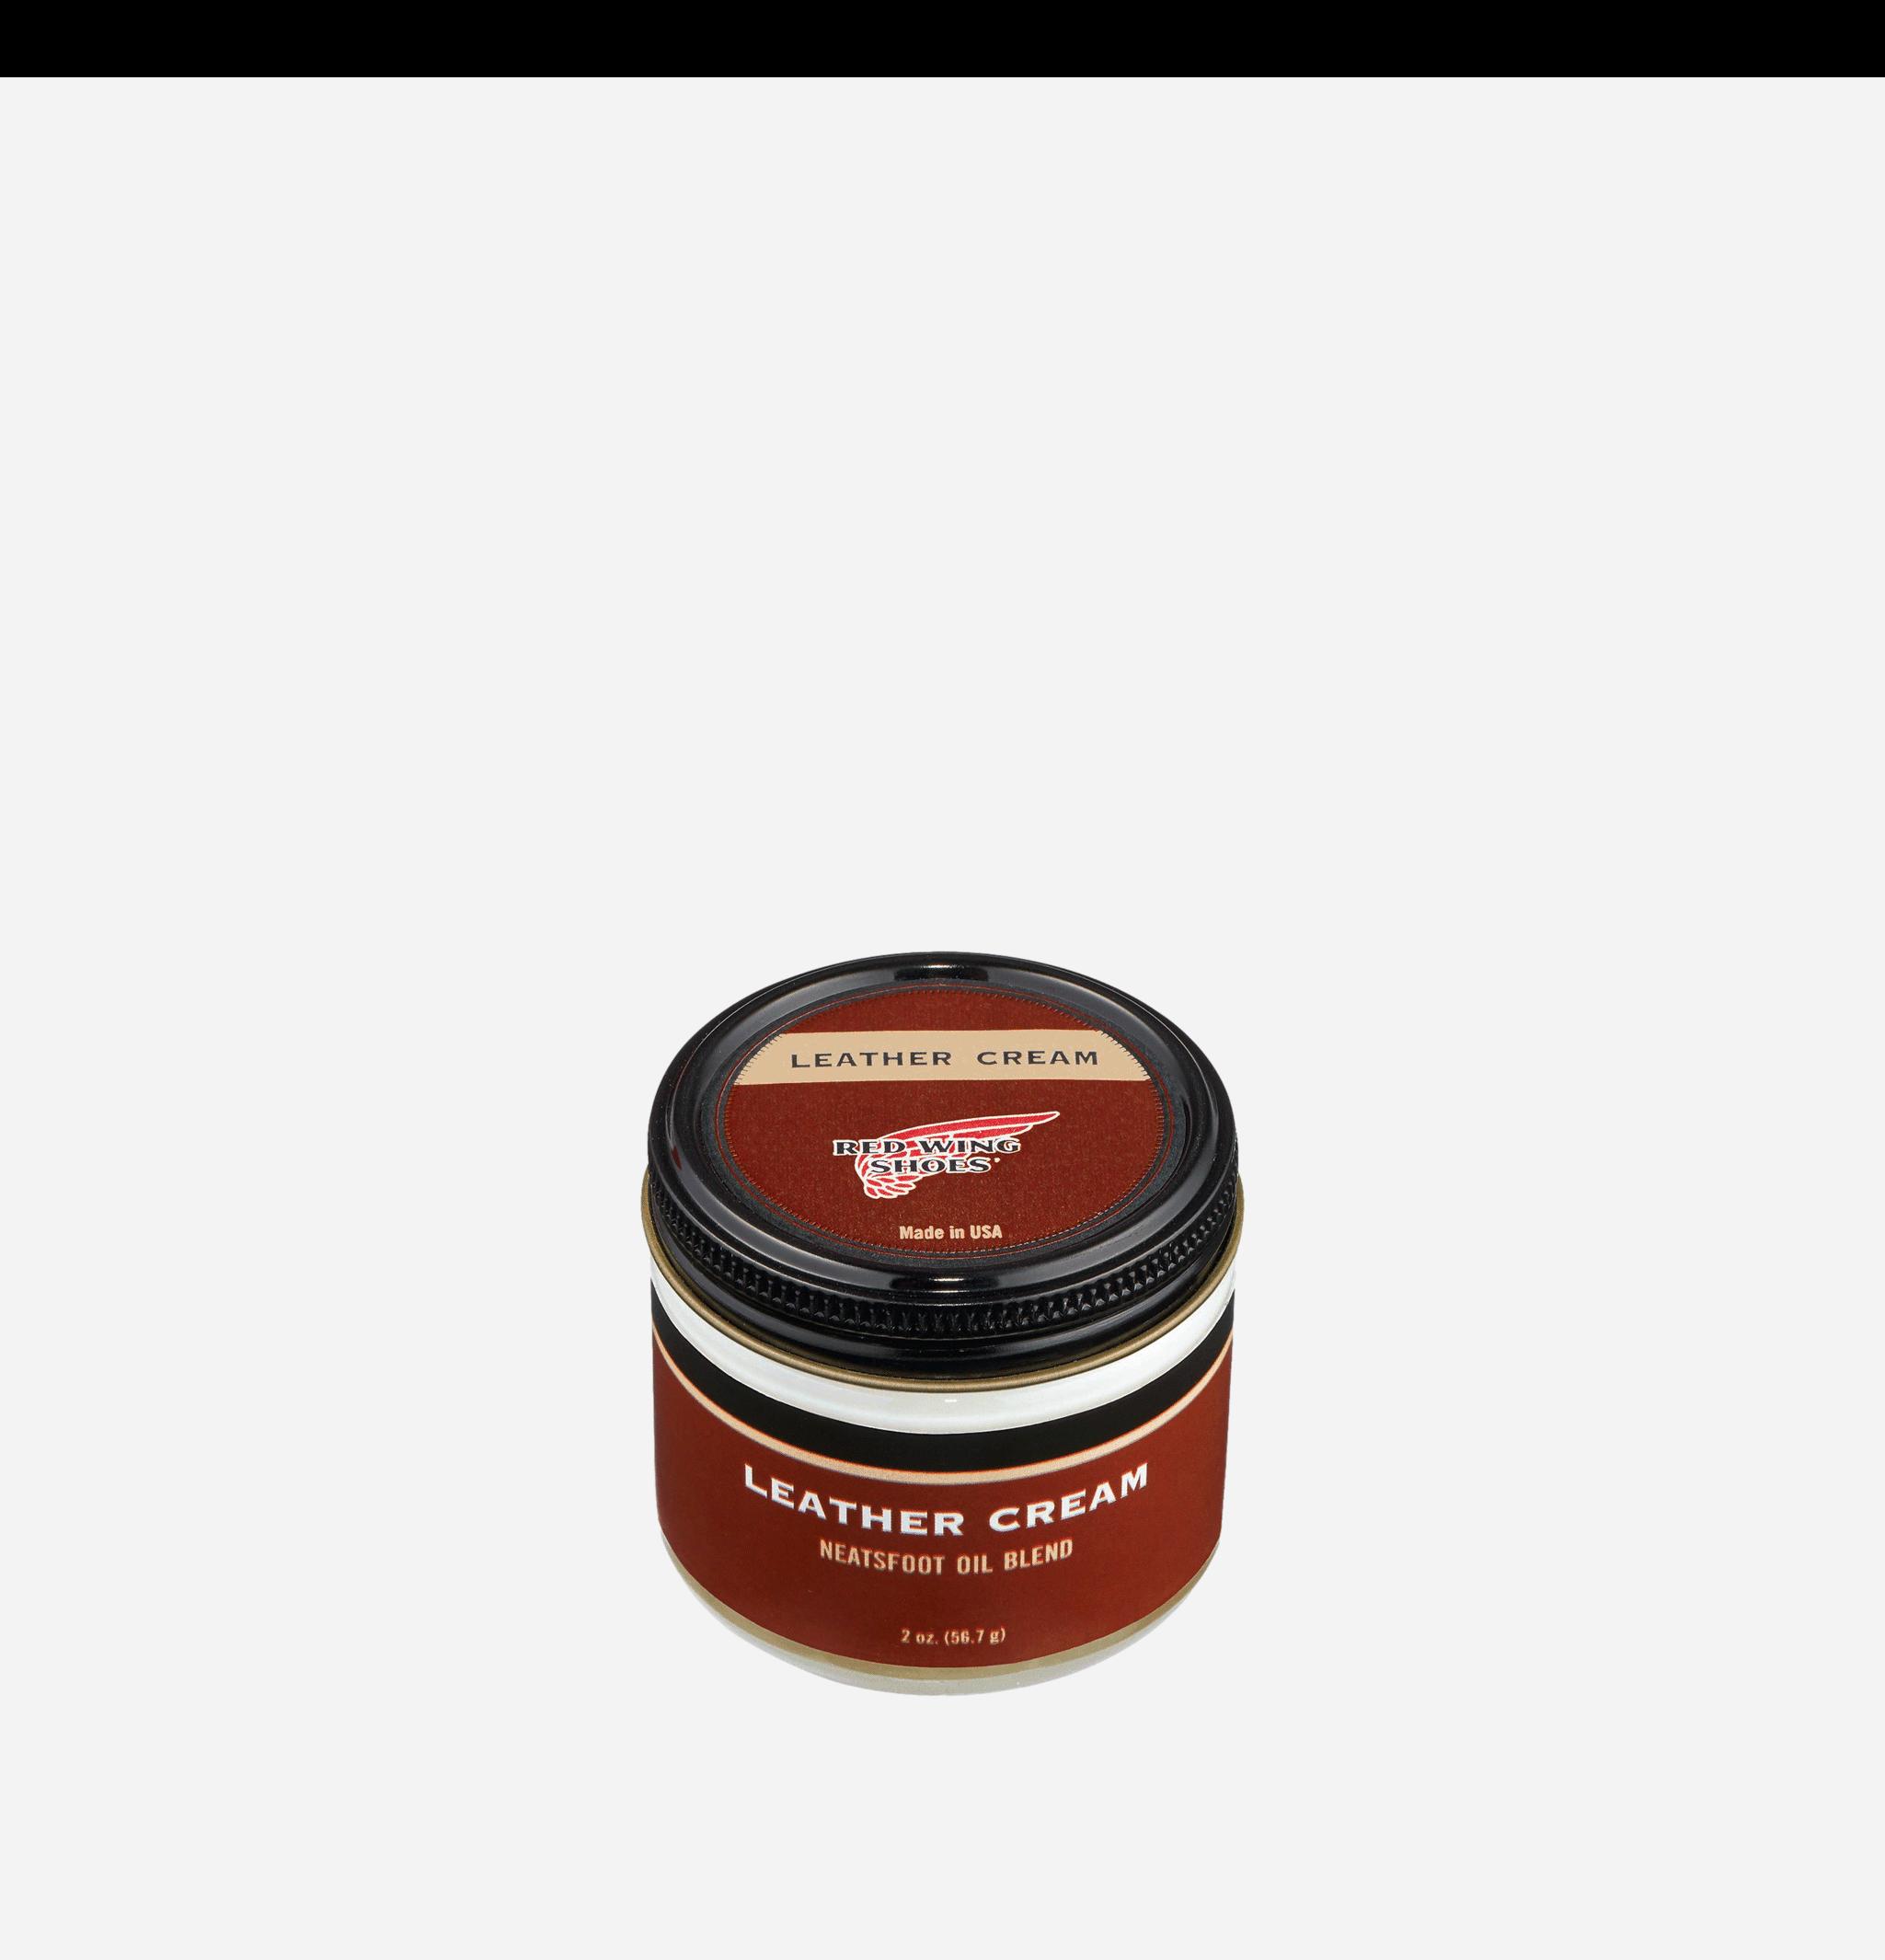 Leather Cream Natural